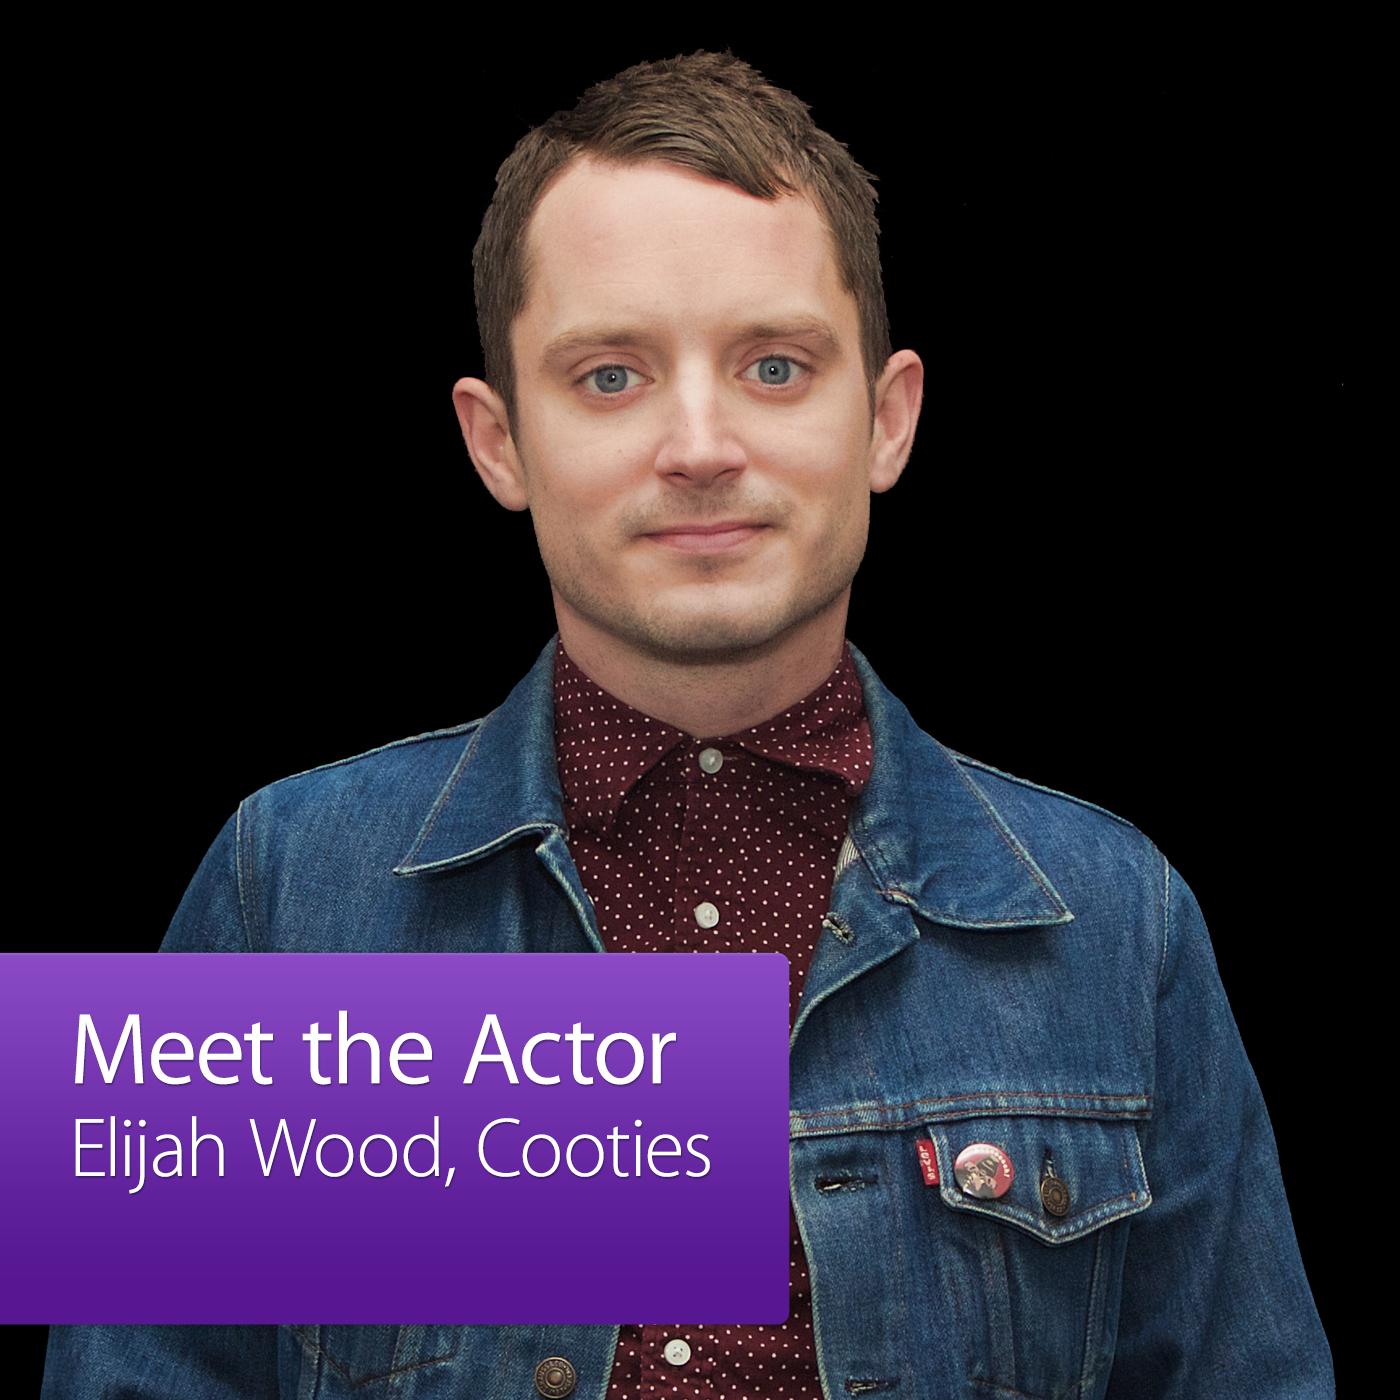 Elijah Wood: Meet the Actor